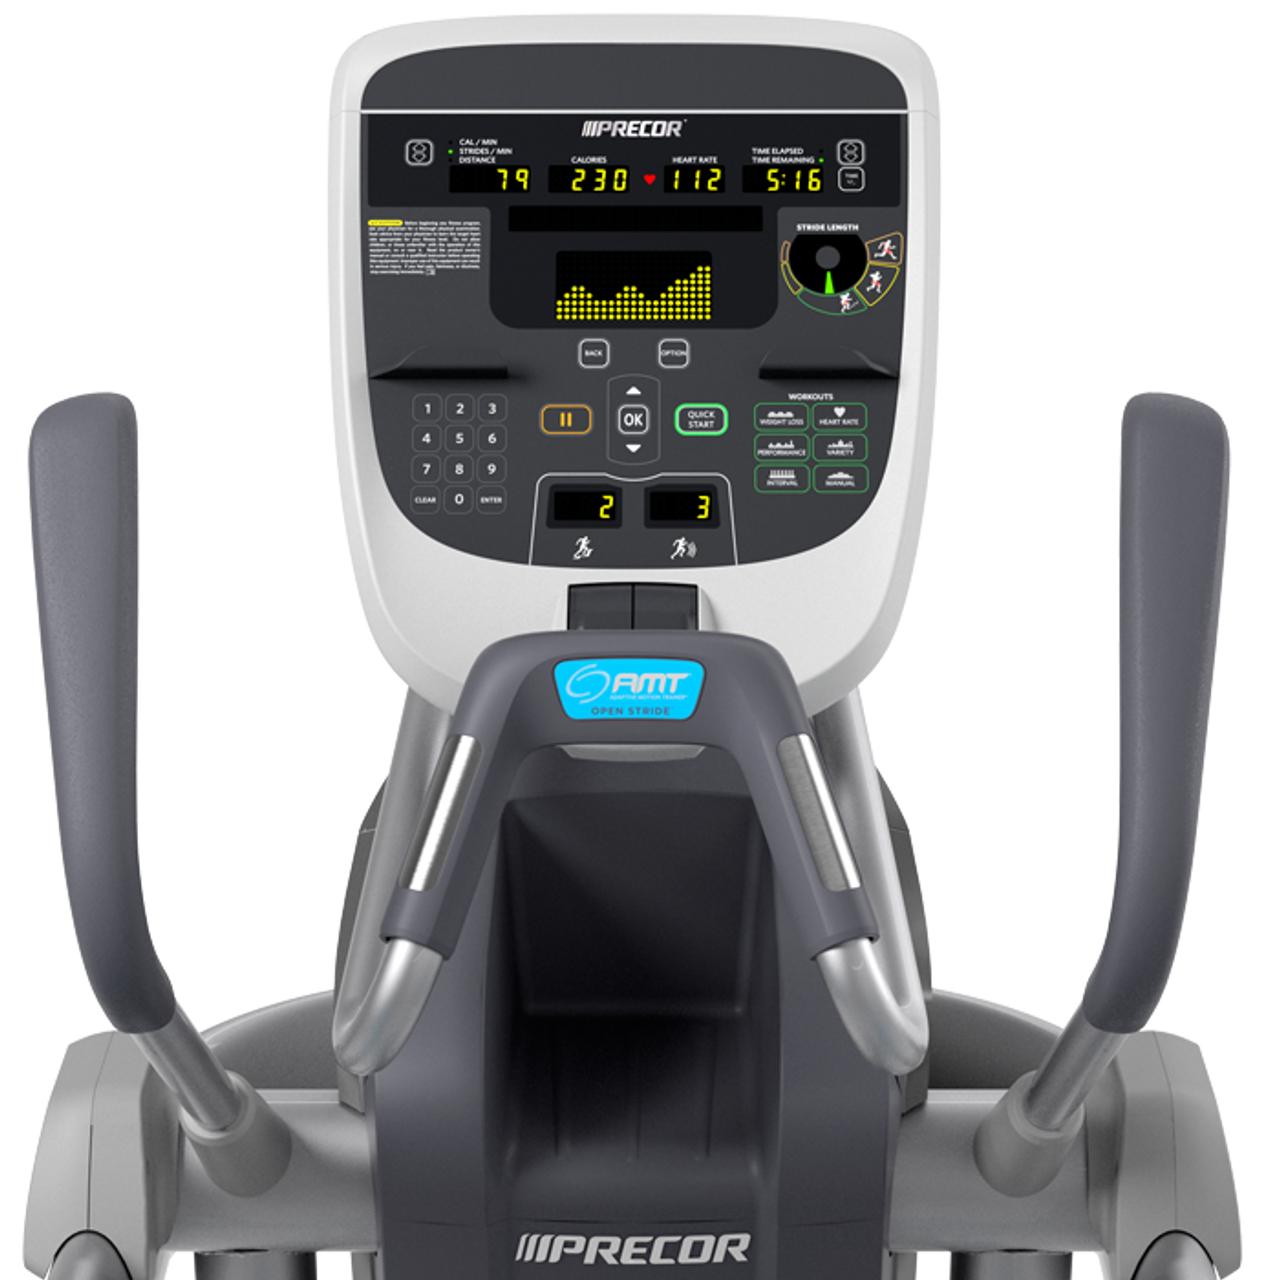 Precor AMT 835 with Open stride